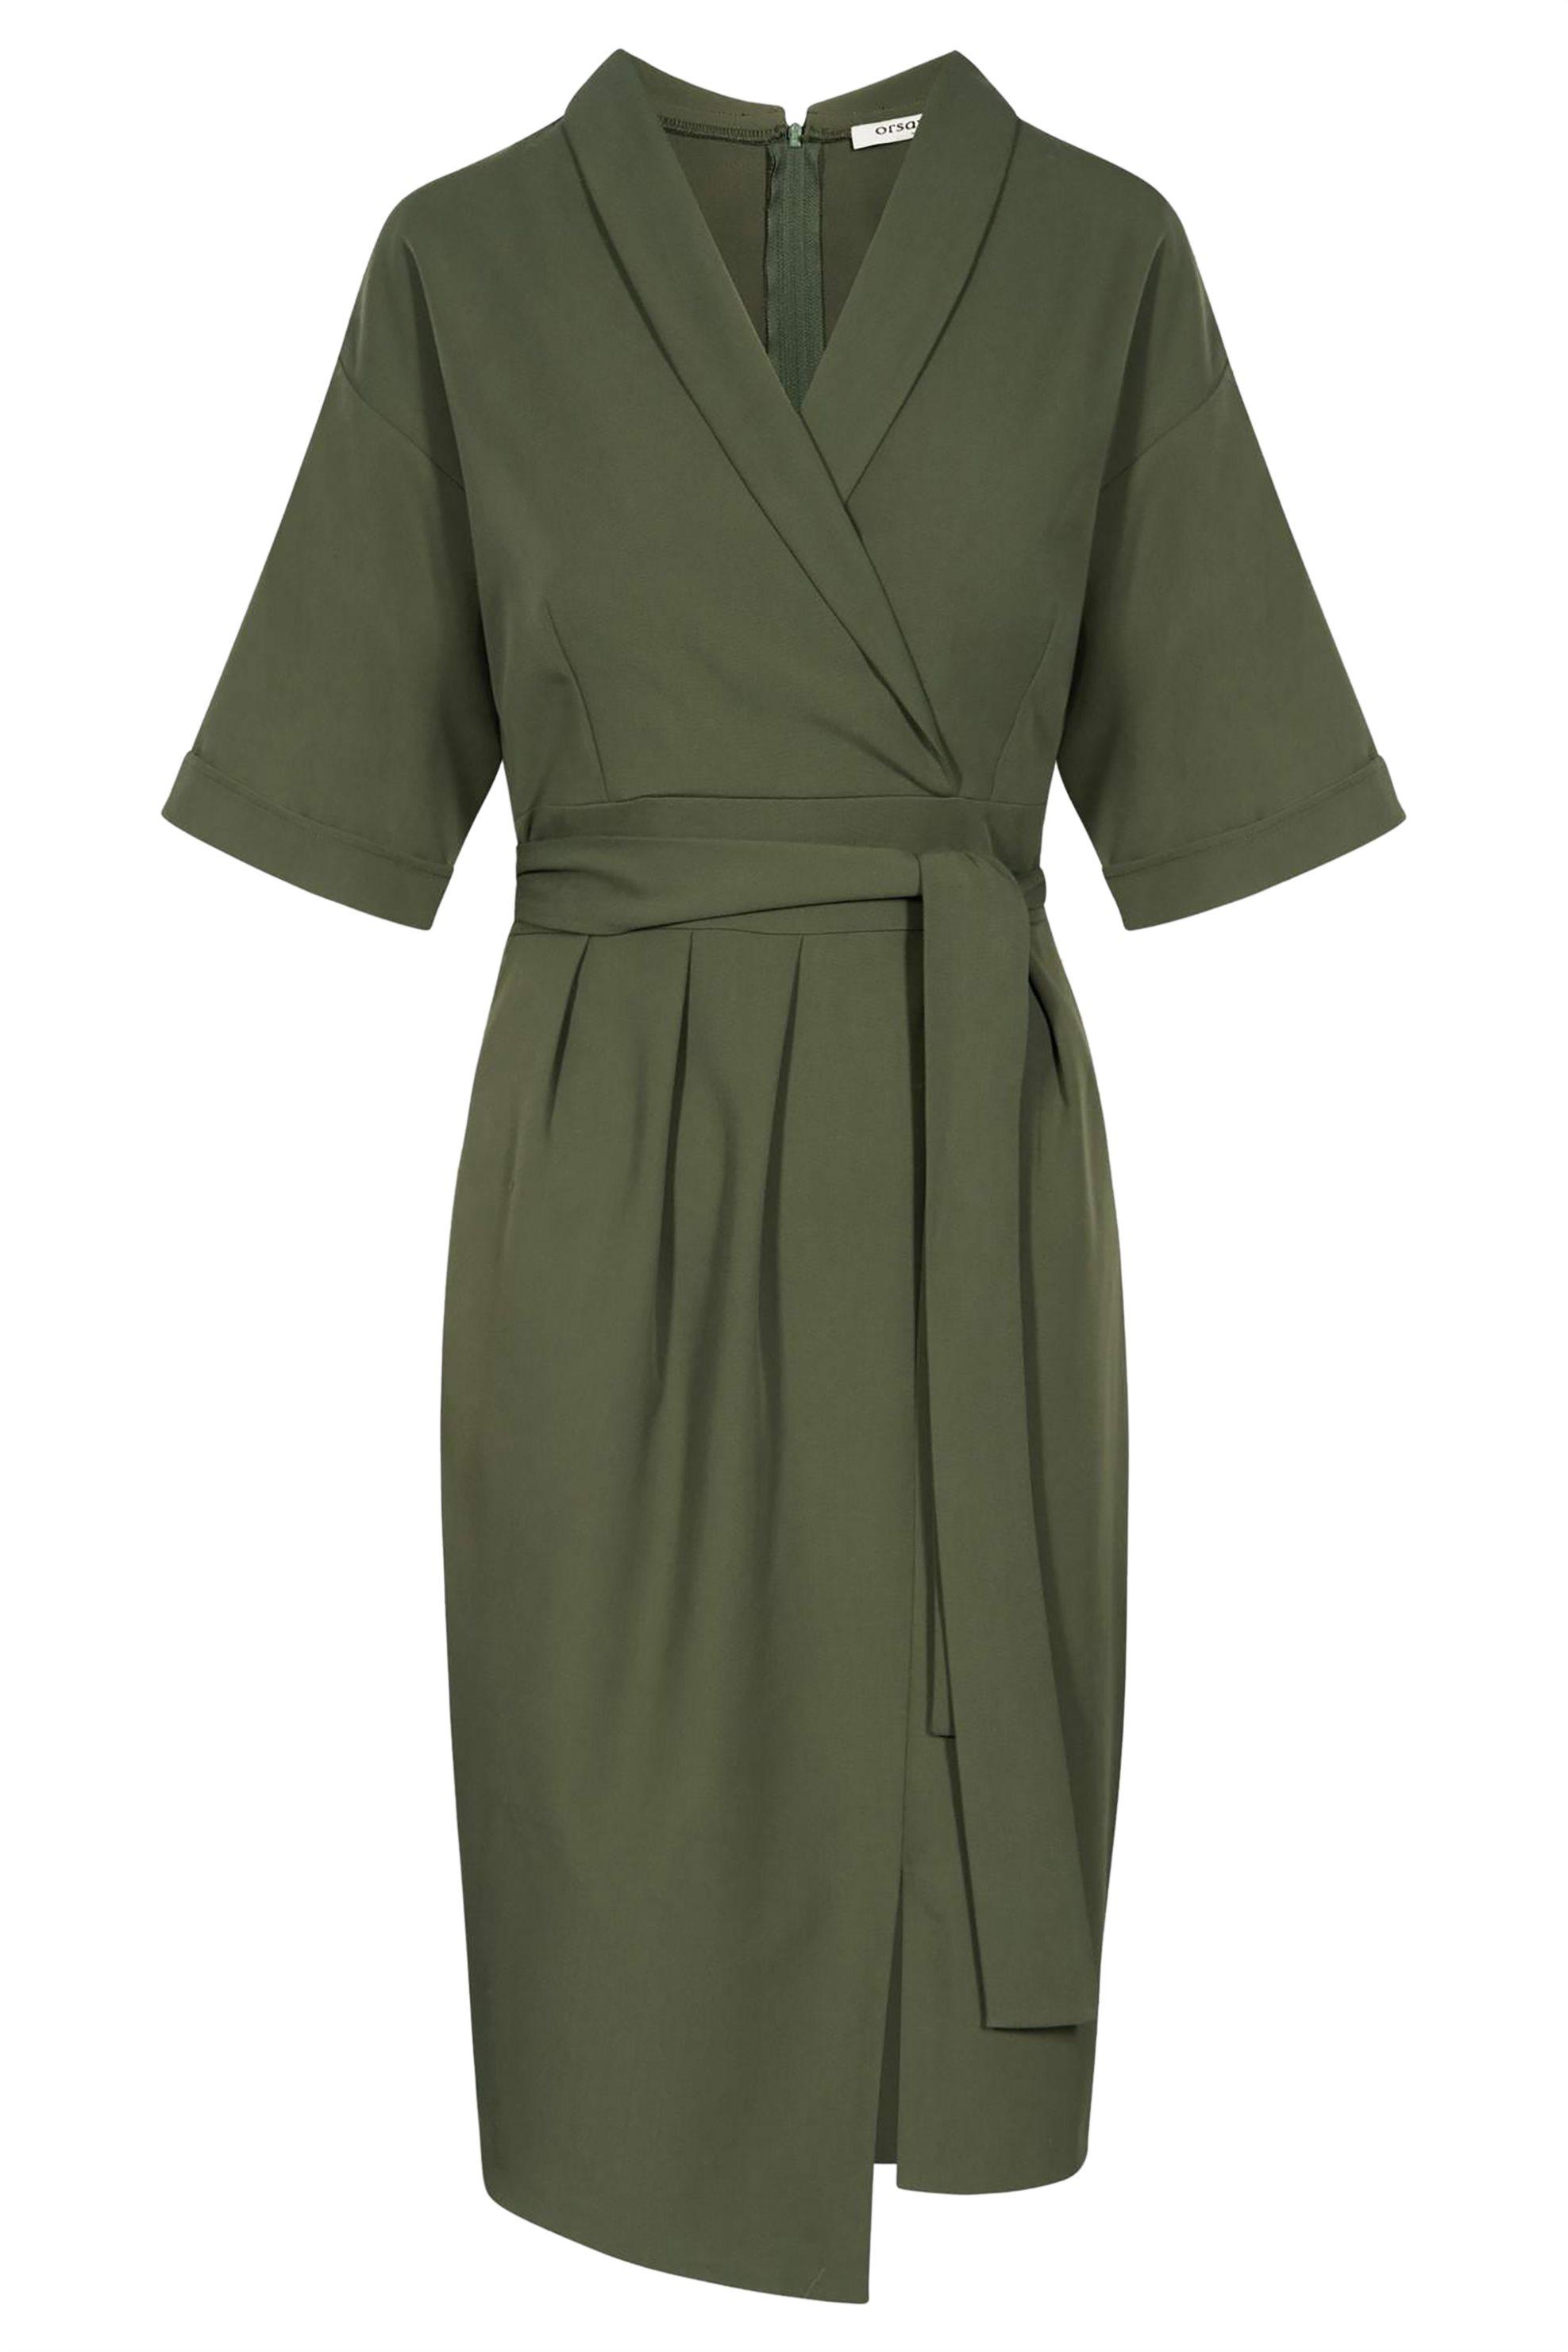 Orsay γυναικείο φόρεμα με wrap σχέδιο - 410161-880000 - Χακί γυναικα   ρουχα   φορέματα   midi φορέματα